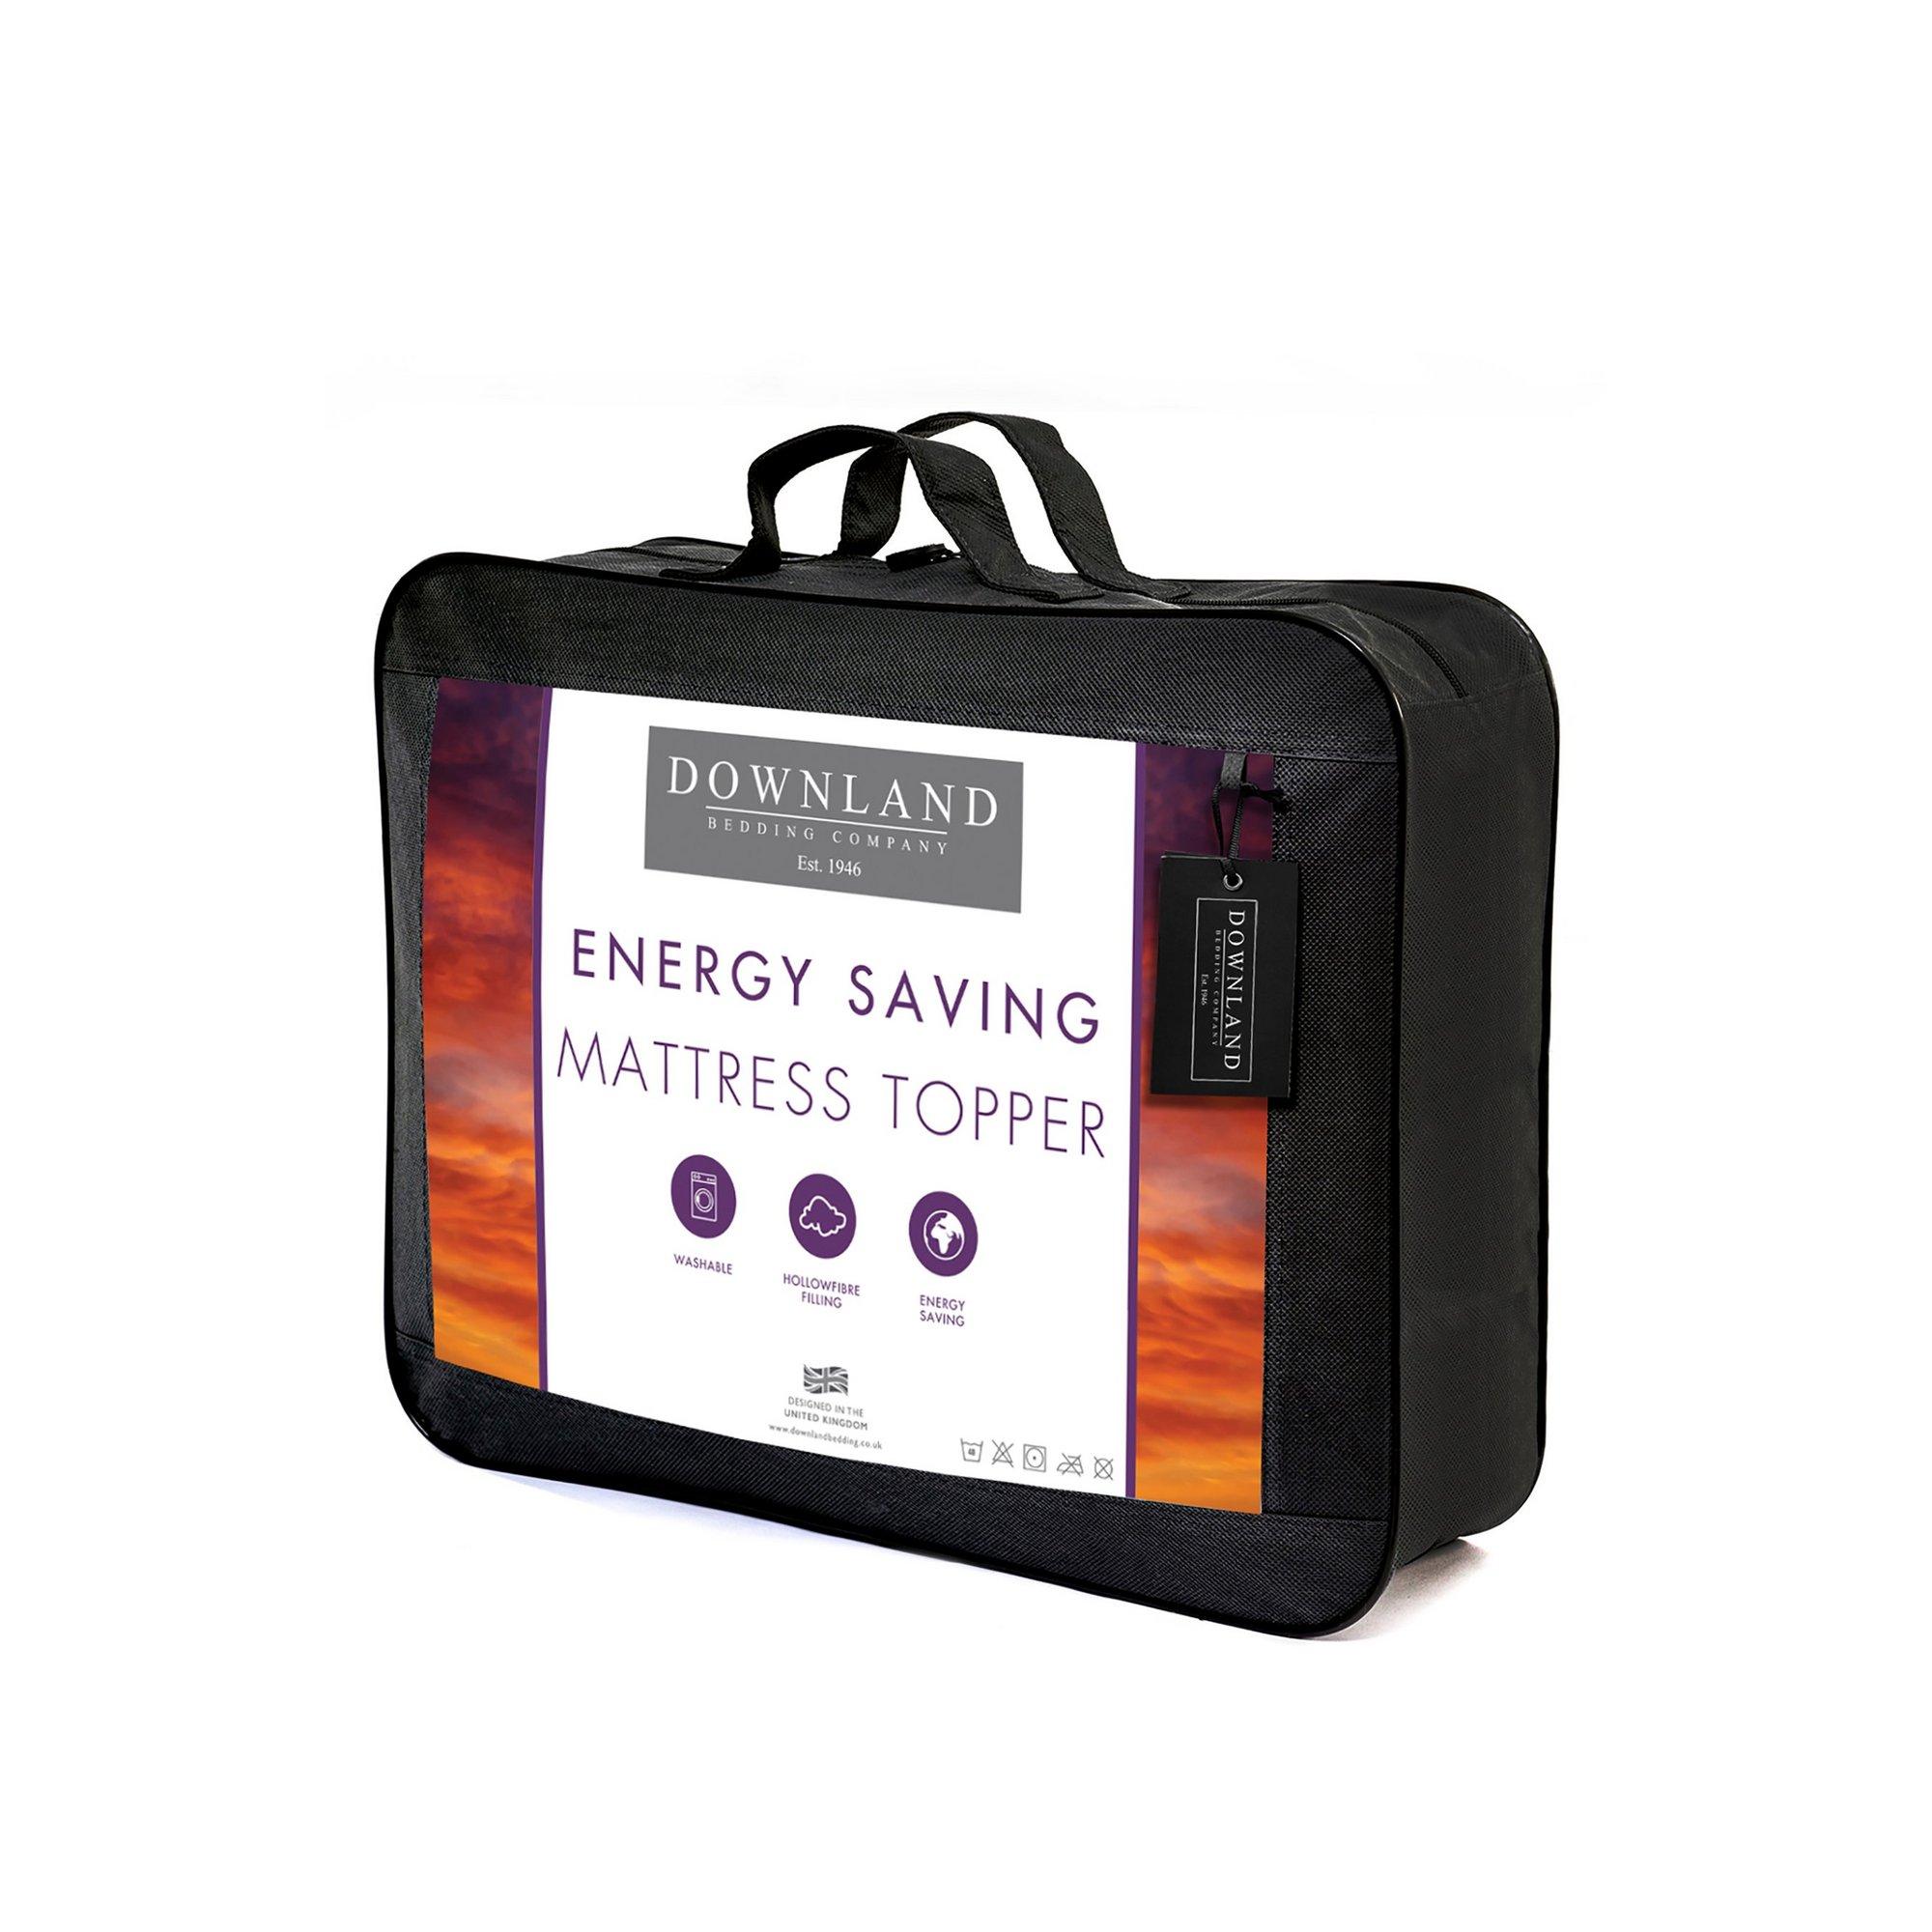 Image of Downland Energy Saving Mattress Topper